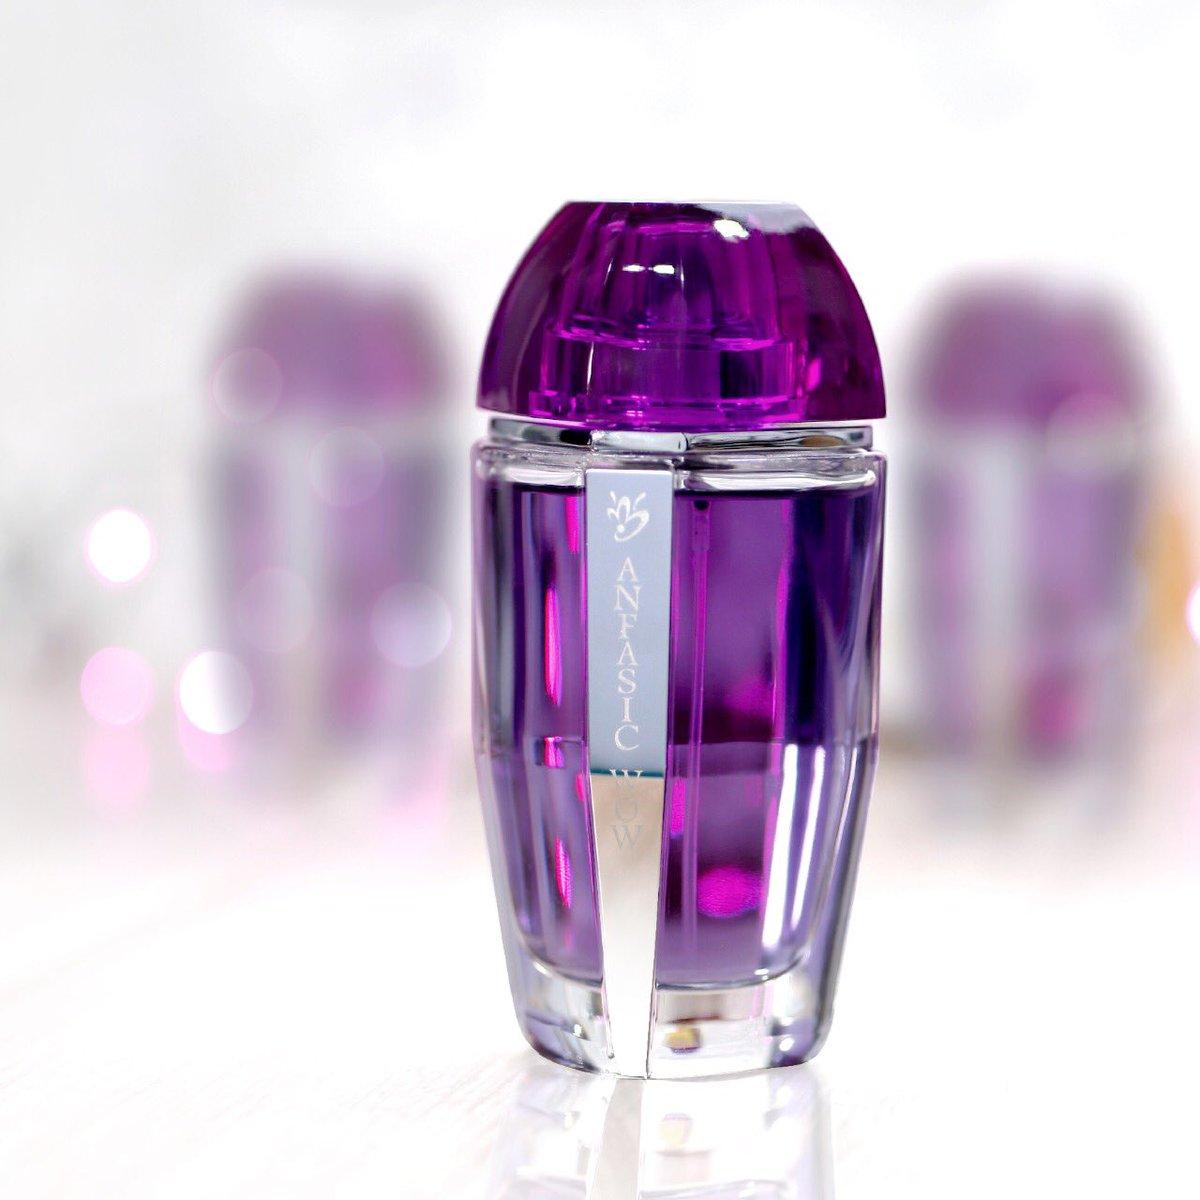 استمتع و انتعش برائحة واو  Feel fresh with the scent of wow! . . Visit our online boutique & shop today: https://t.co/ImWzm6yWMa   snapchat:mhilalgroup @mhilalgroup @mohamedhilalgroup #مجموعة_محمد_هلال #رائد_إبداع_إماراتي #كلنا_نقدر#انفاسك_دخون #عطورات https://t.co/ZJ302YRFnY